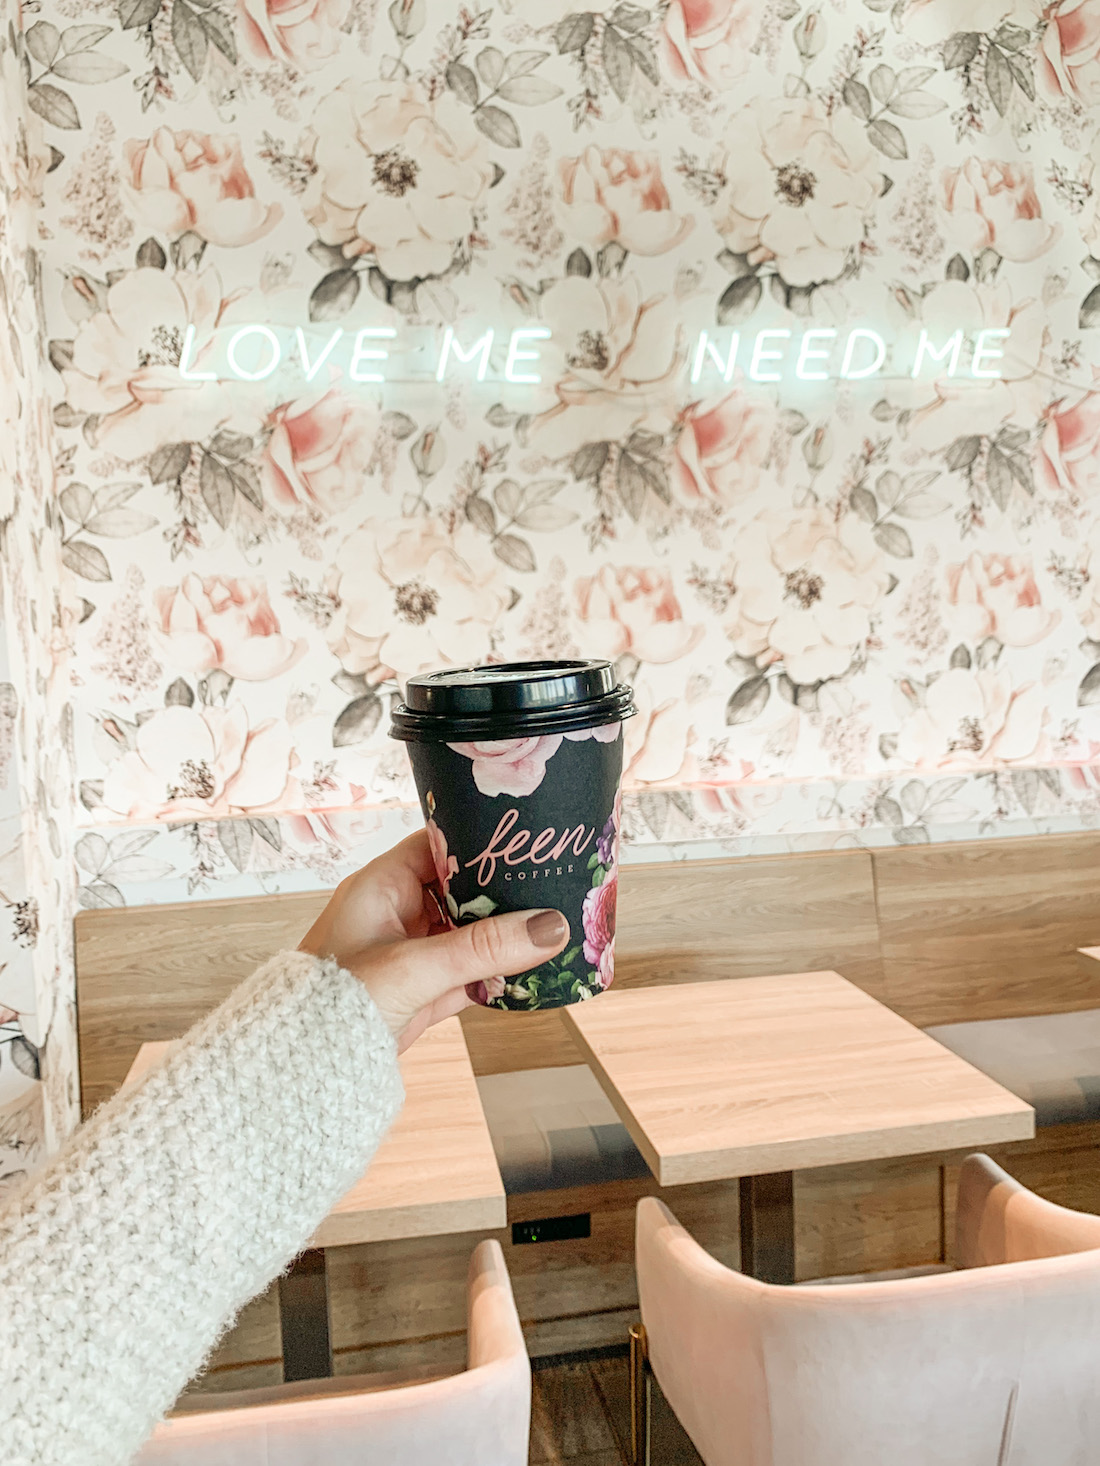 feen coffee shop